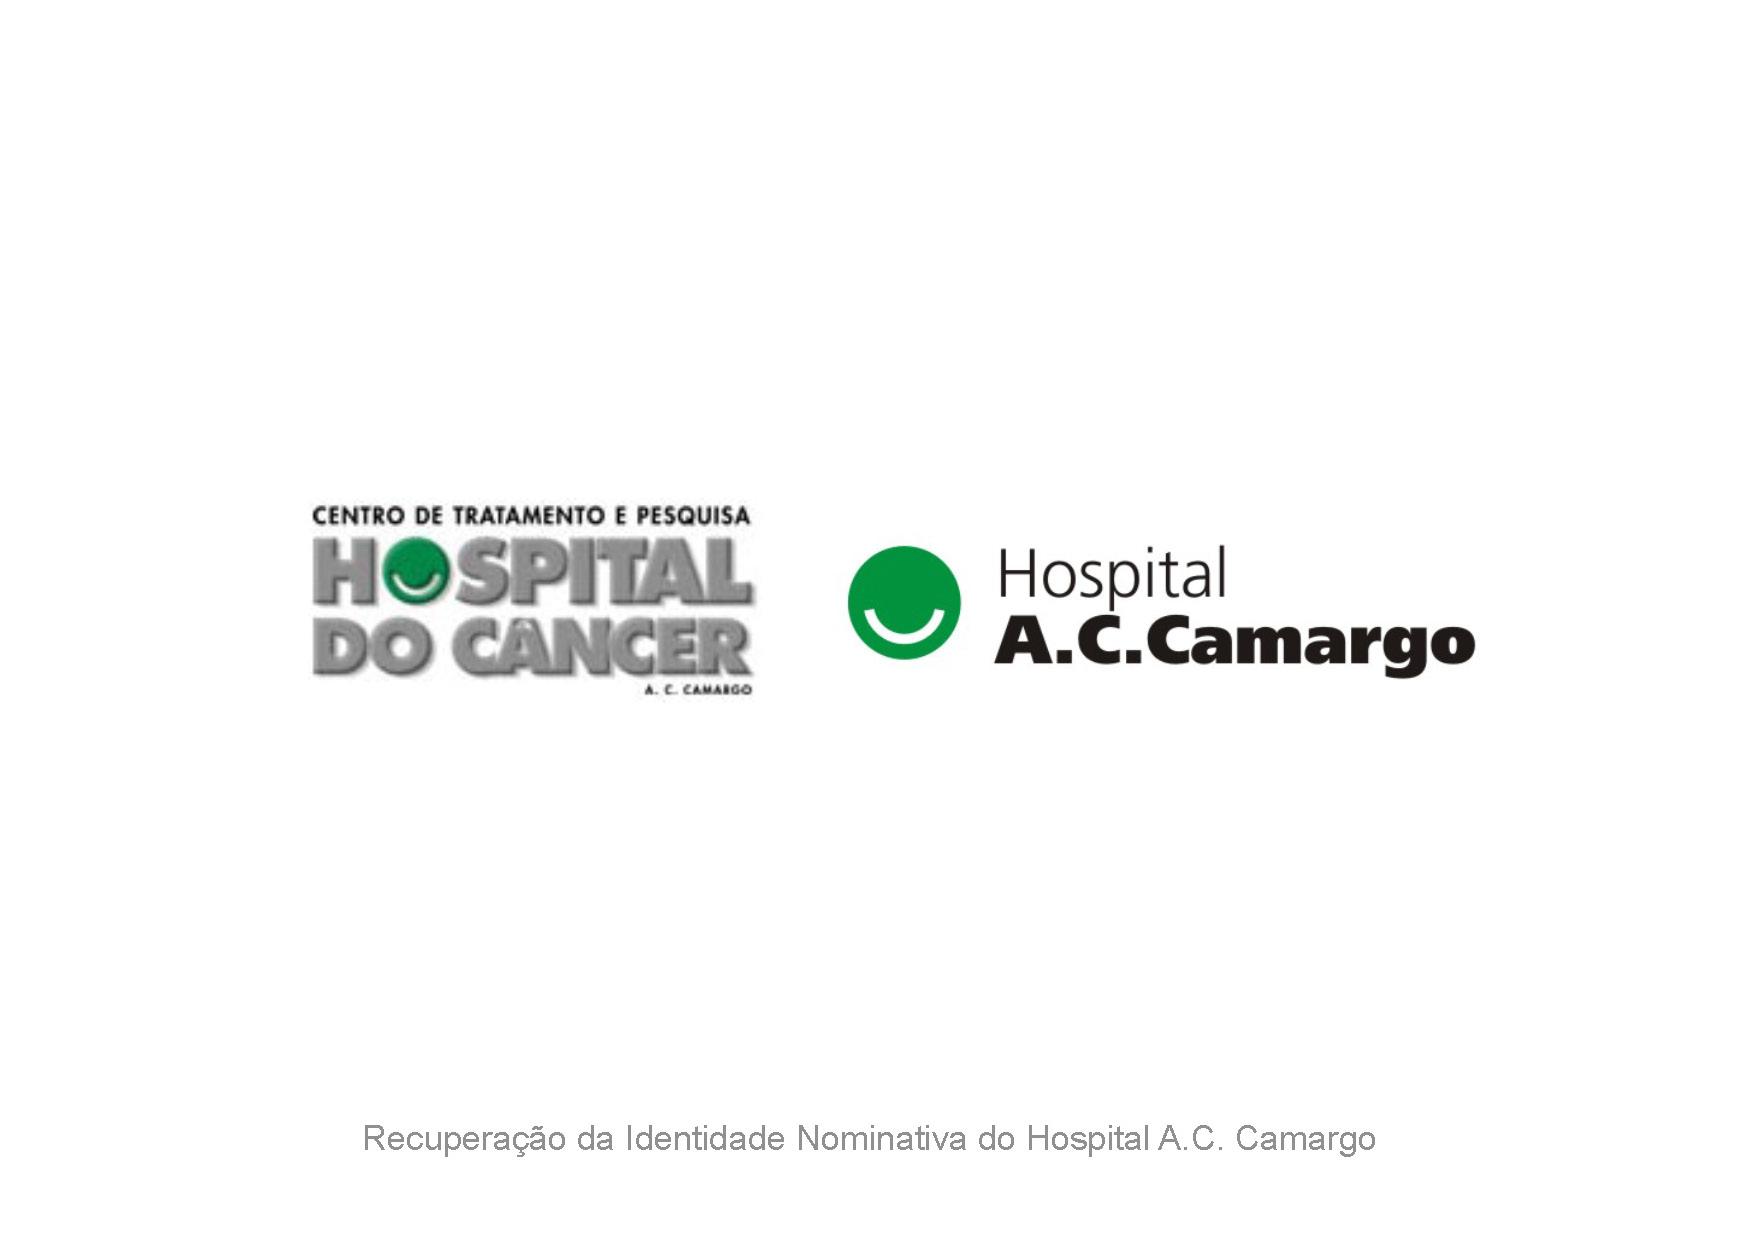 Logotipo Hospital A.C. Camargo